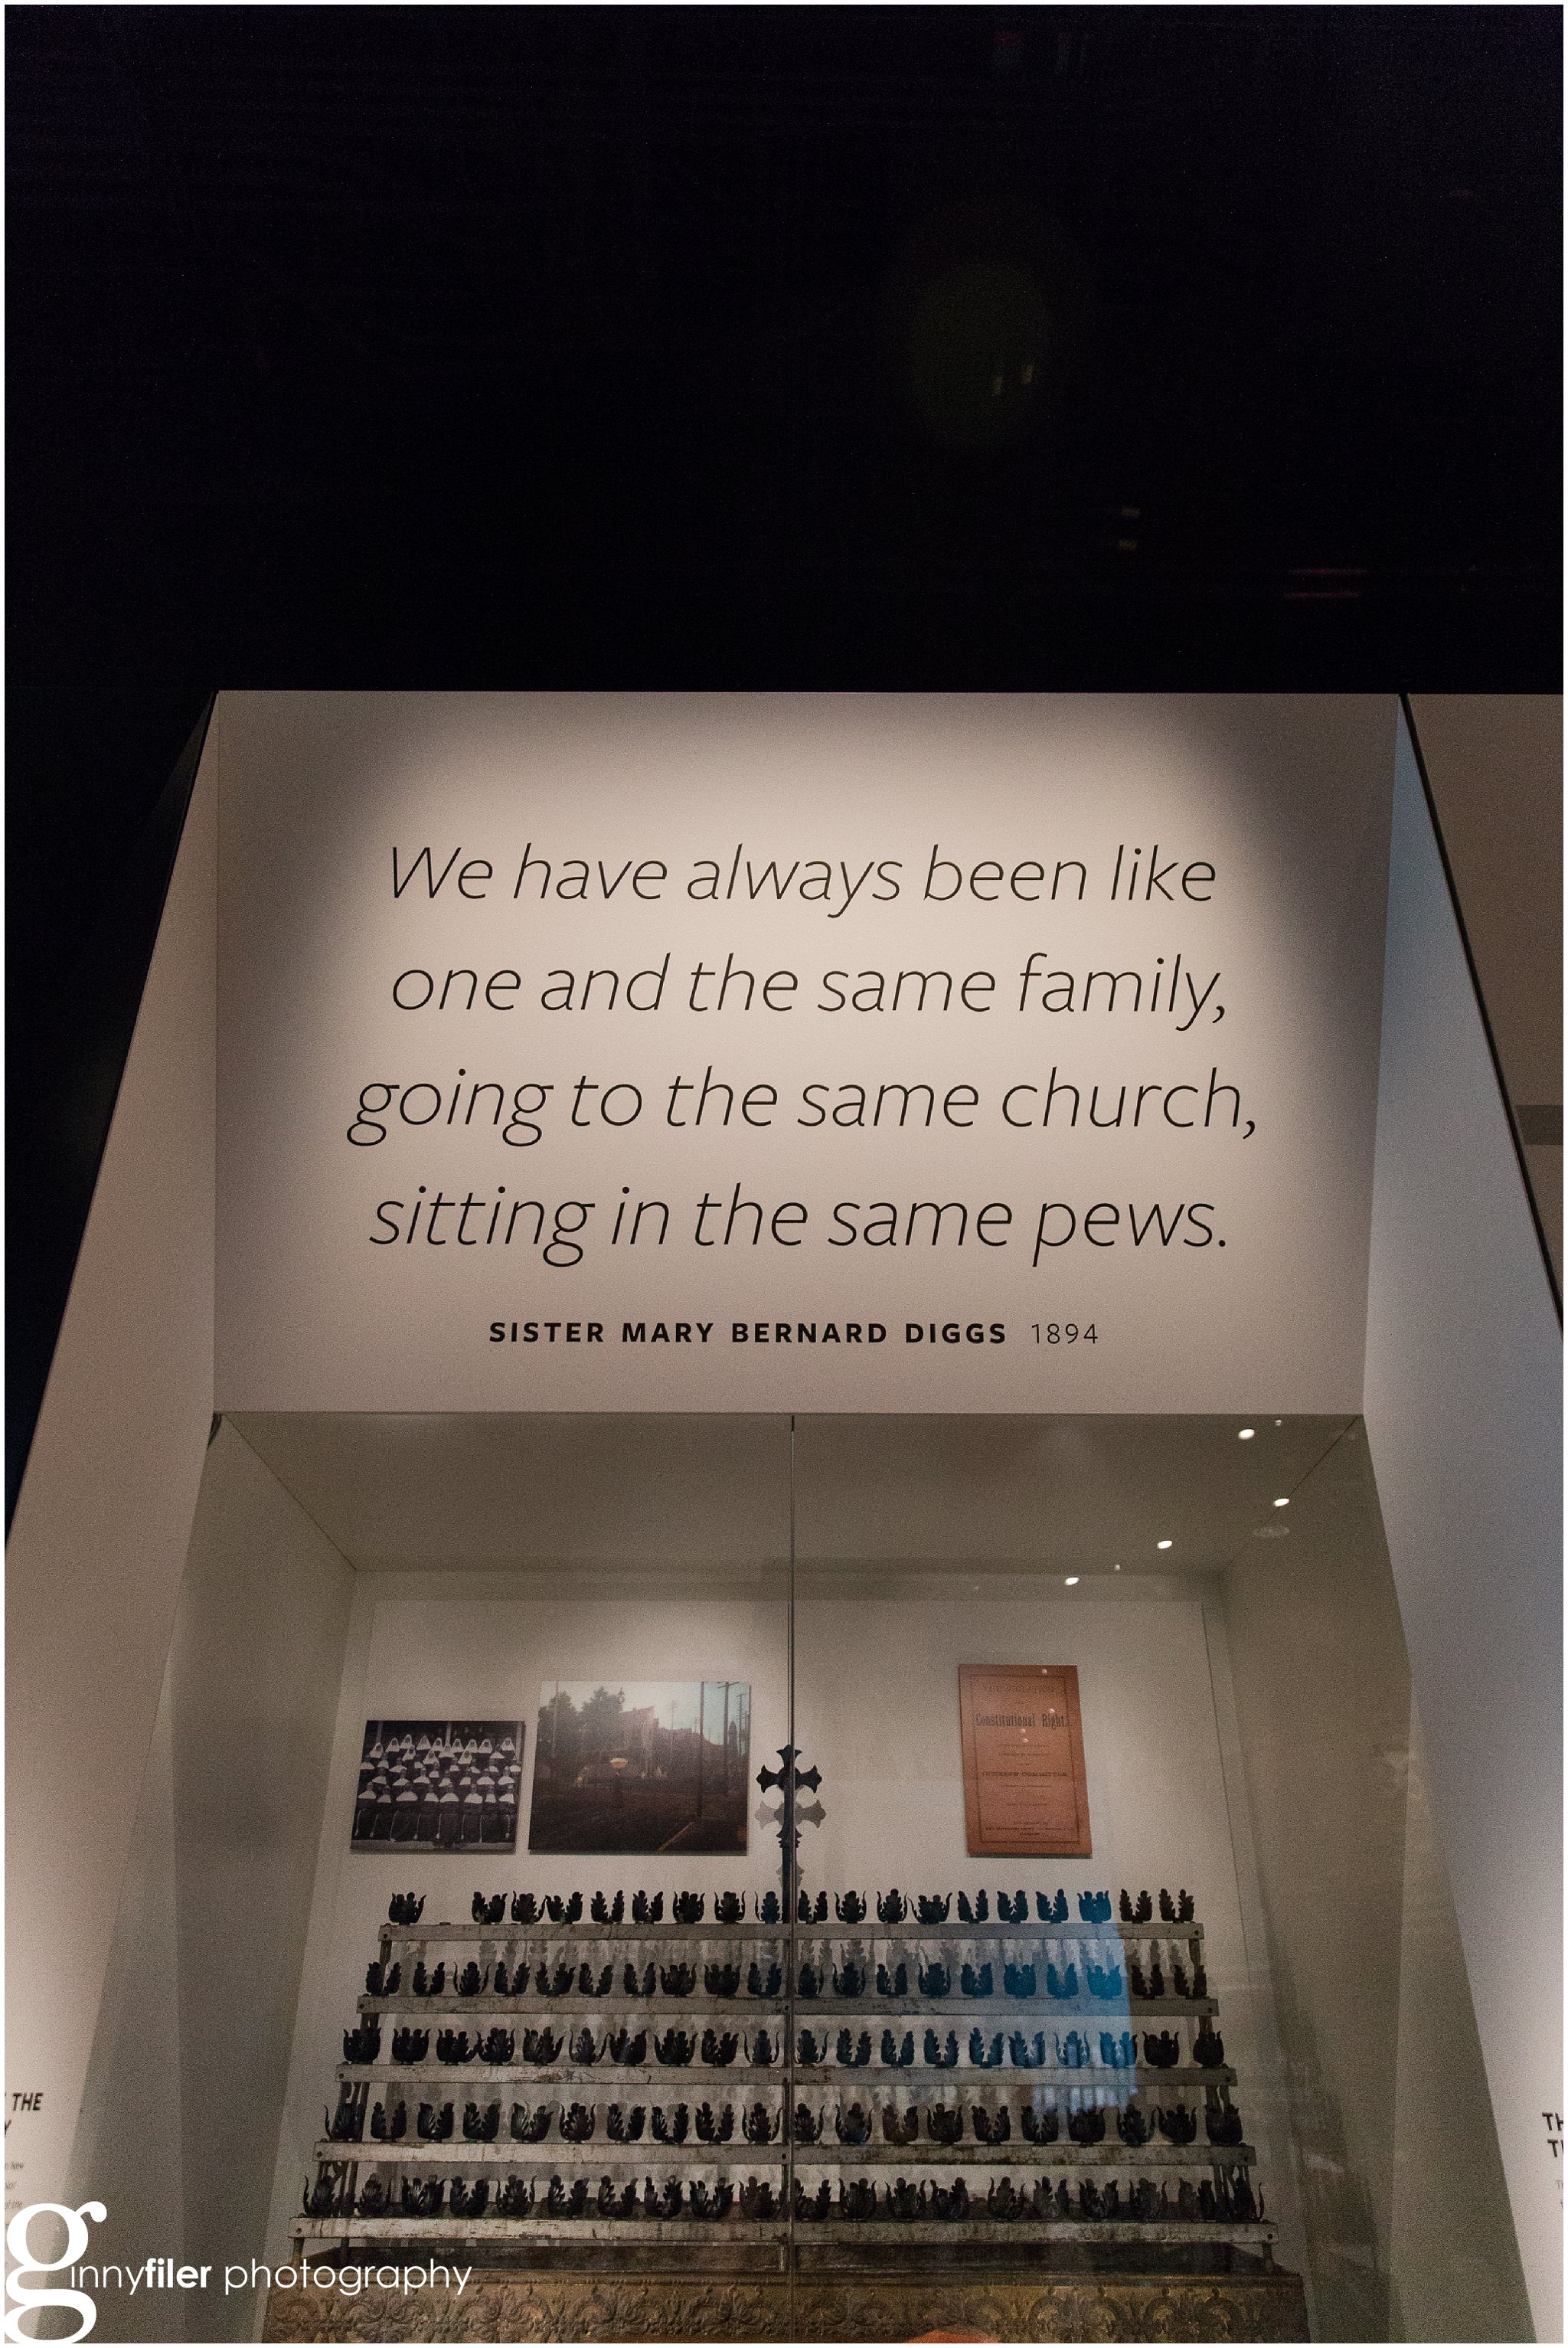 NMAAHC_museum_0022.jpg